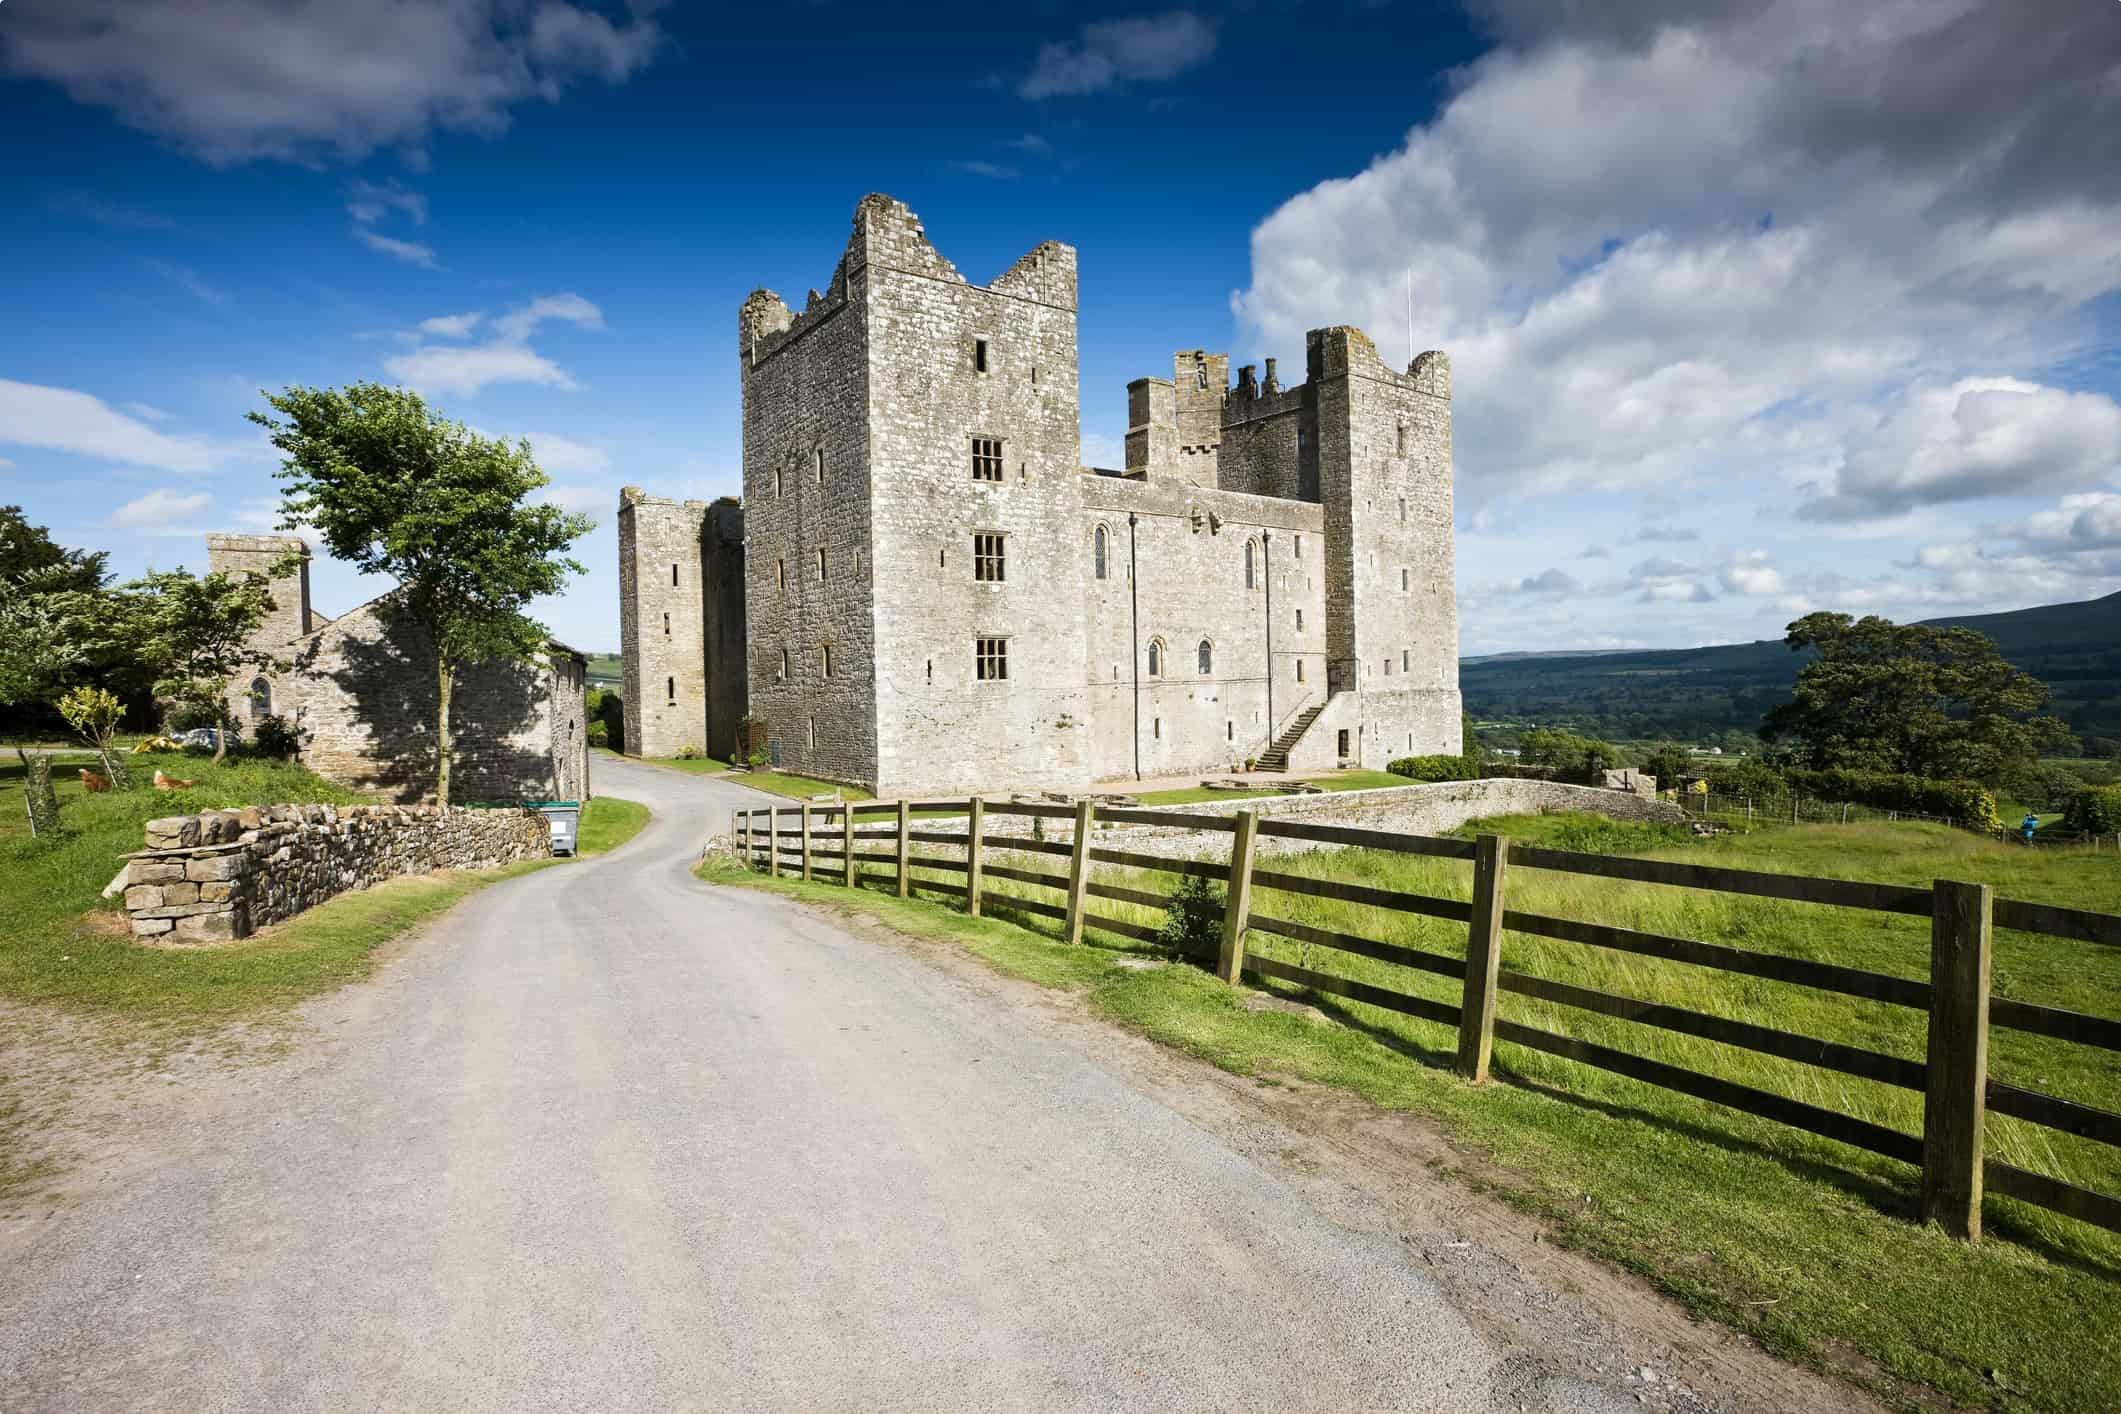 Manorial Castle in Wensleydale